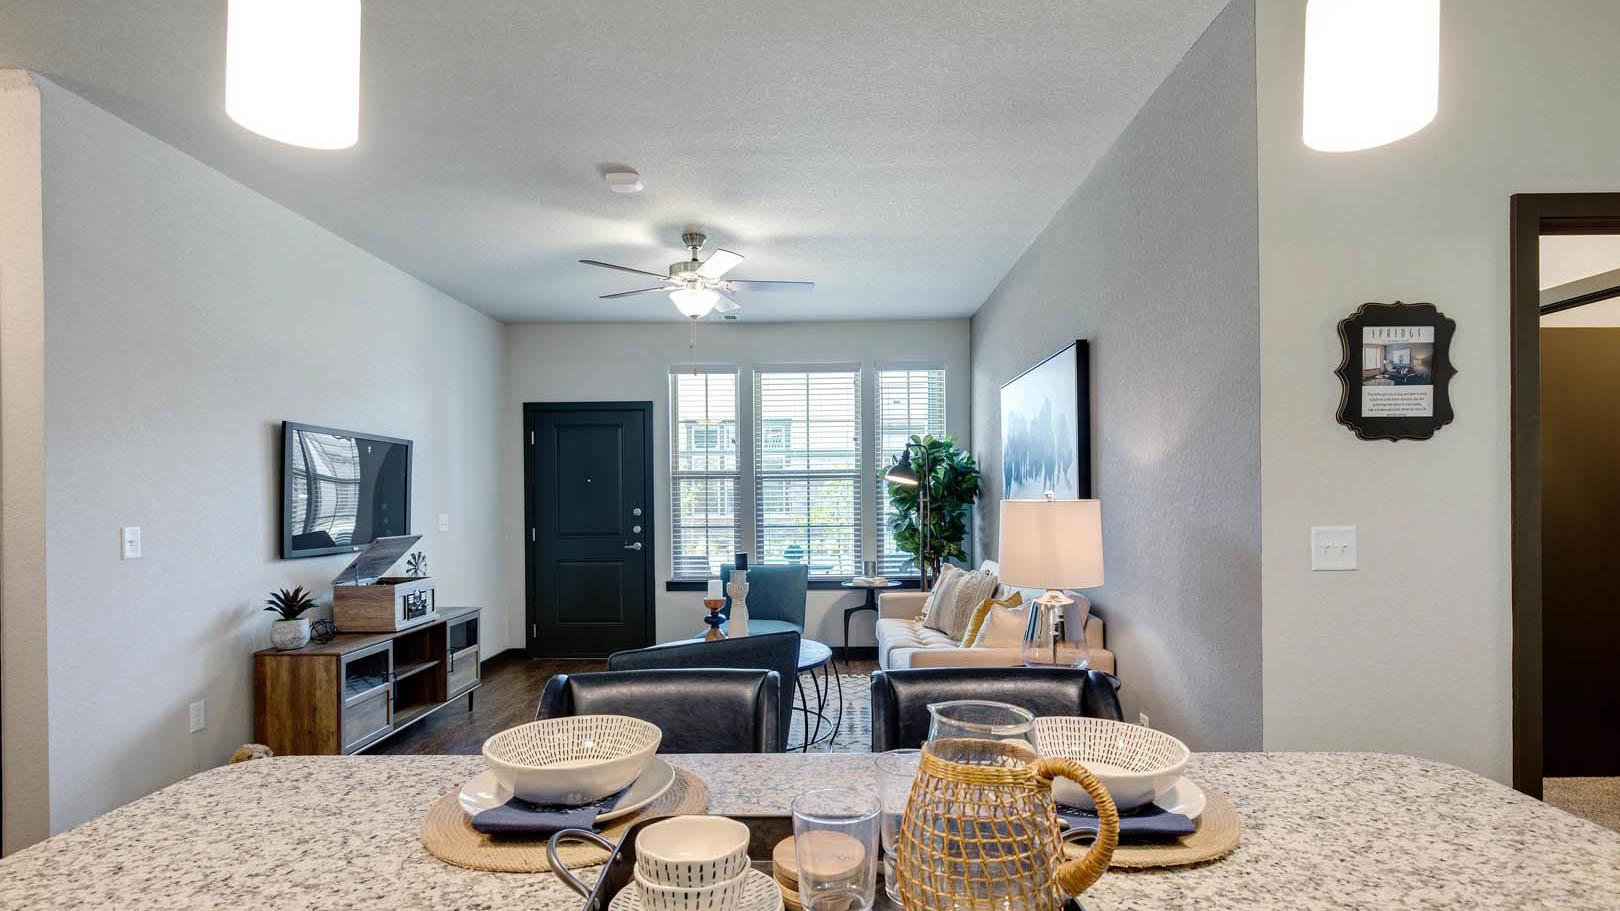 Kitchen and living room in Rosenberg, TX